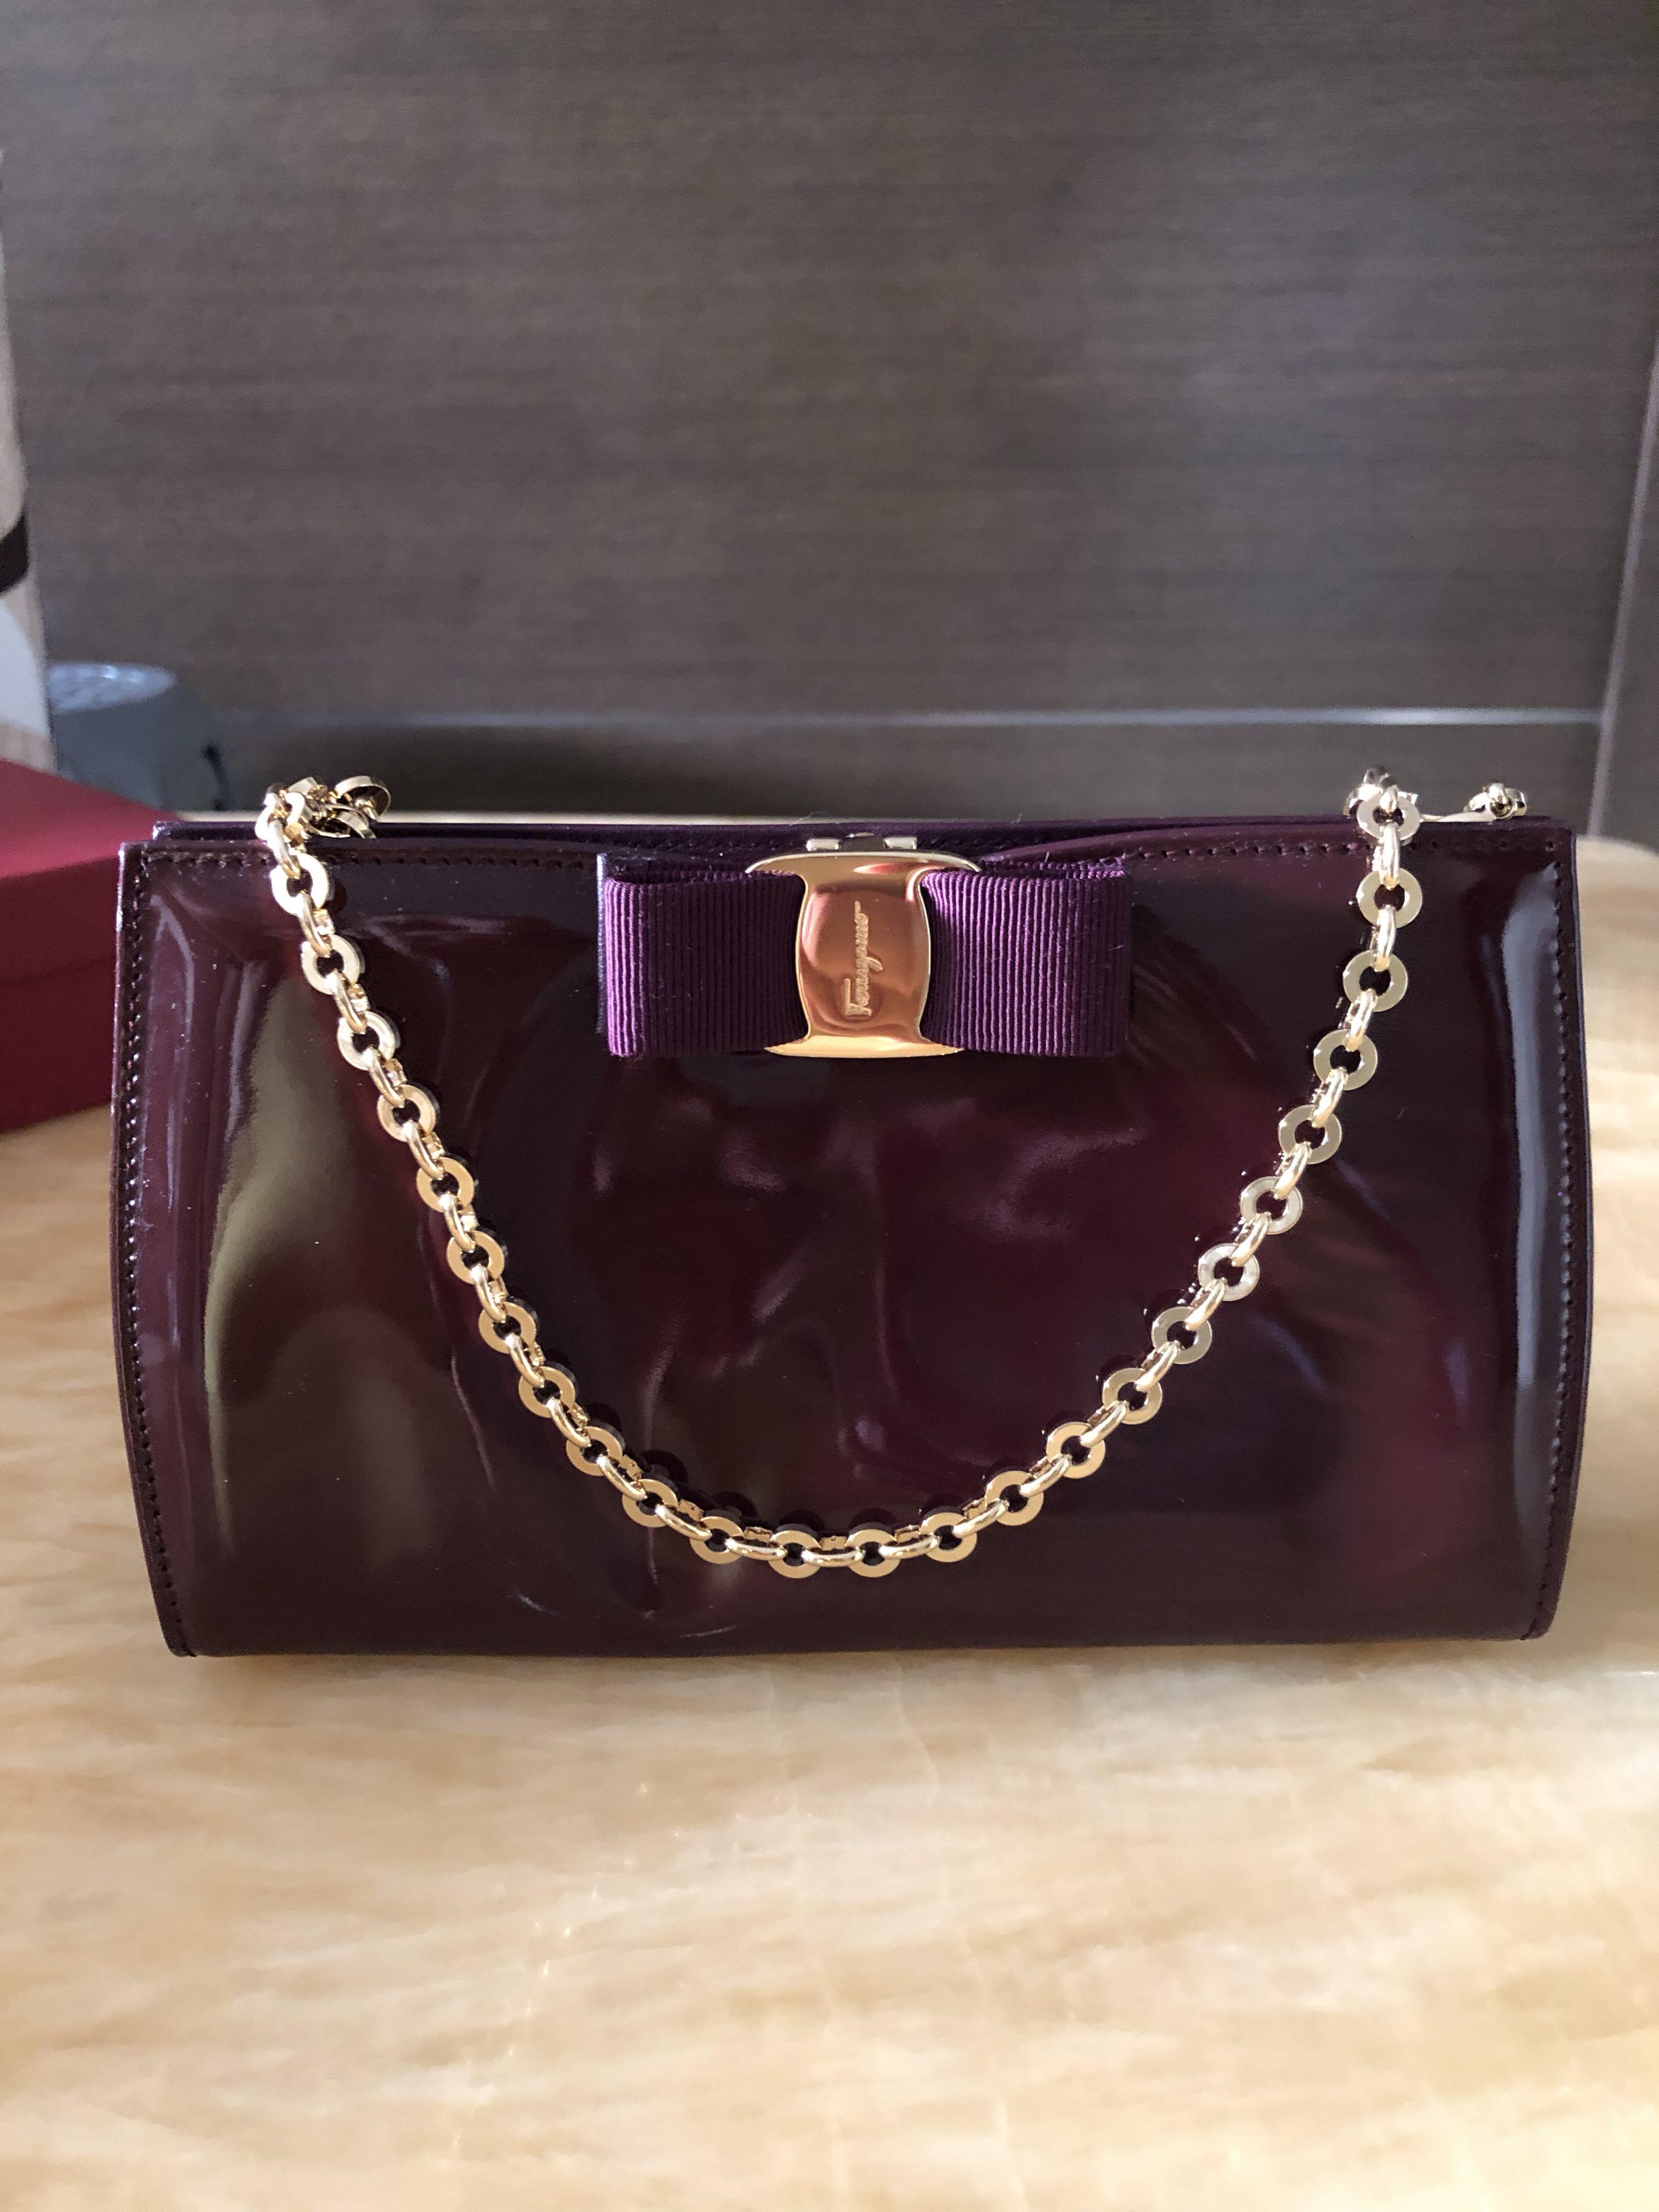 2d79cc189464 Salvatore Ferragamo Miss Vara Patent Leather Clutch on Chain